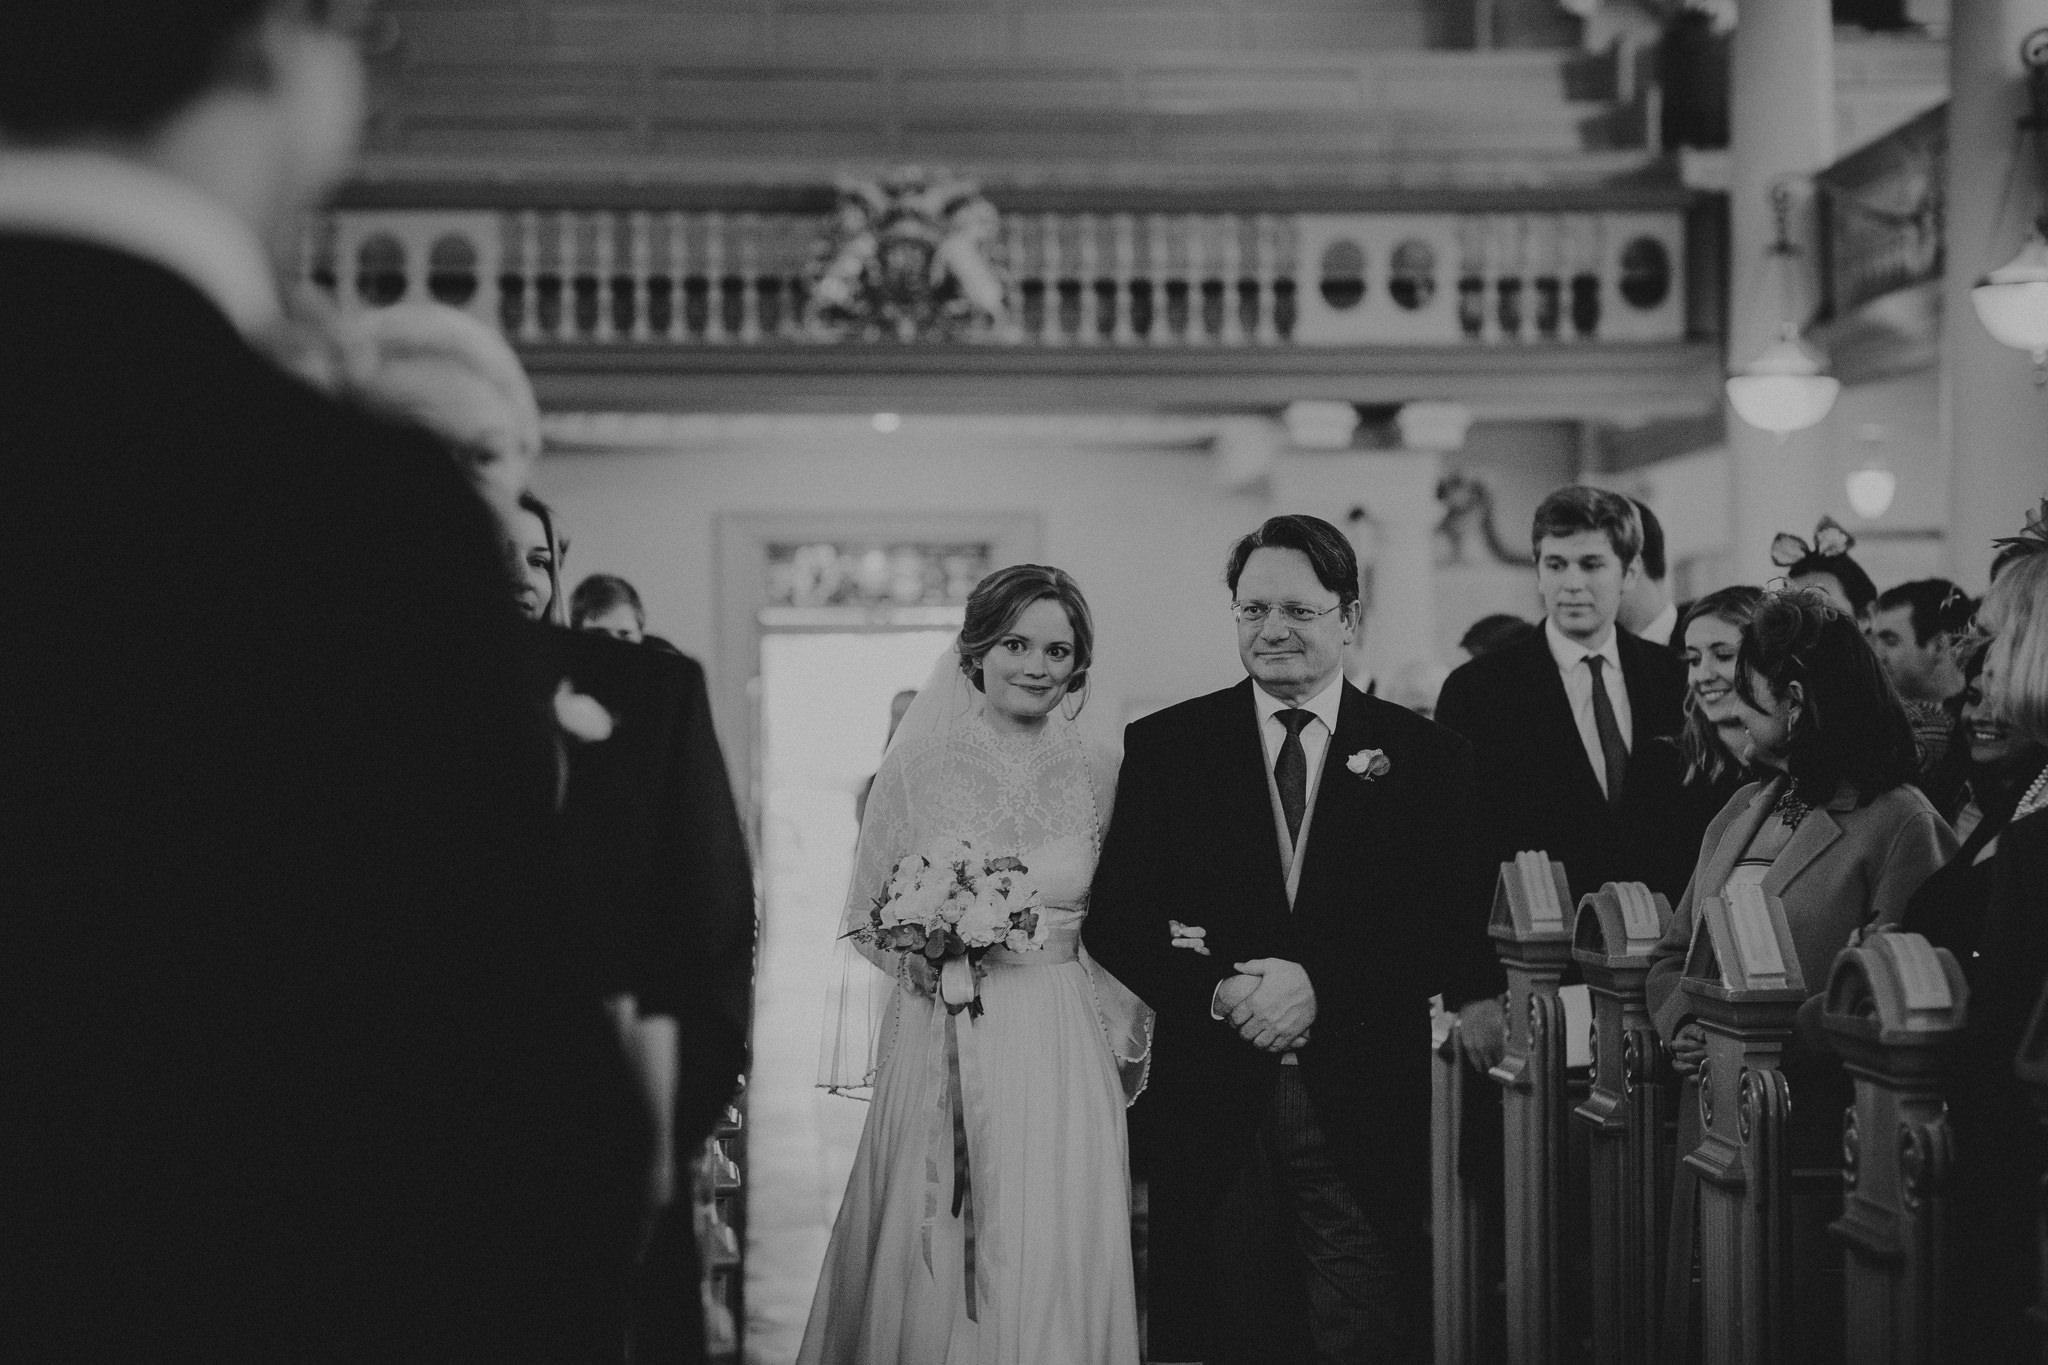 hampstead_wedding_photography_kate_gray-9.jpg